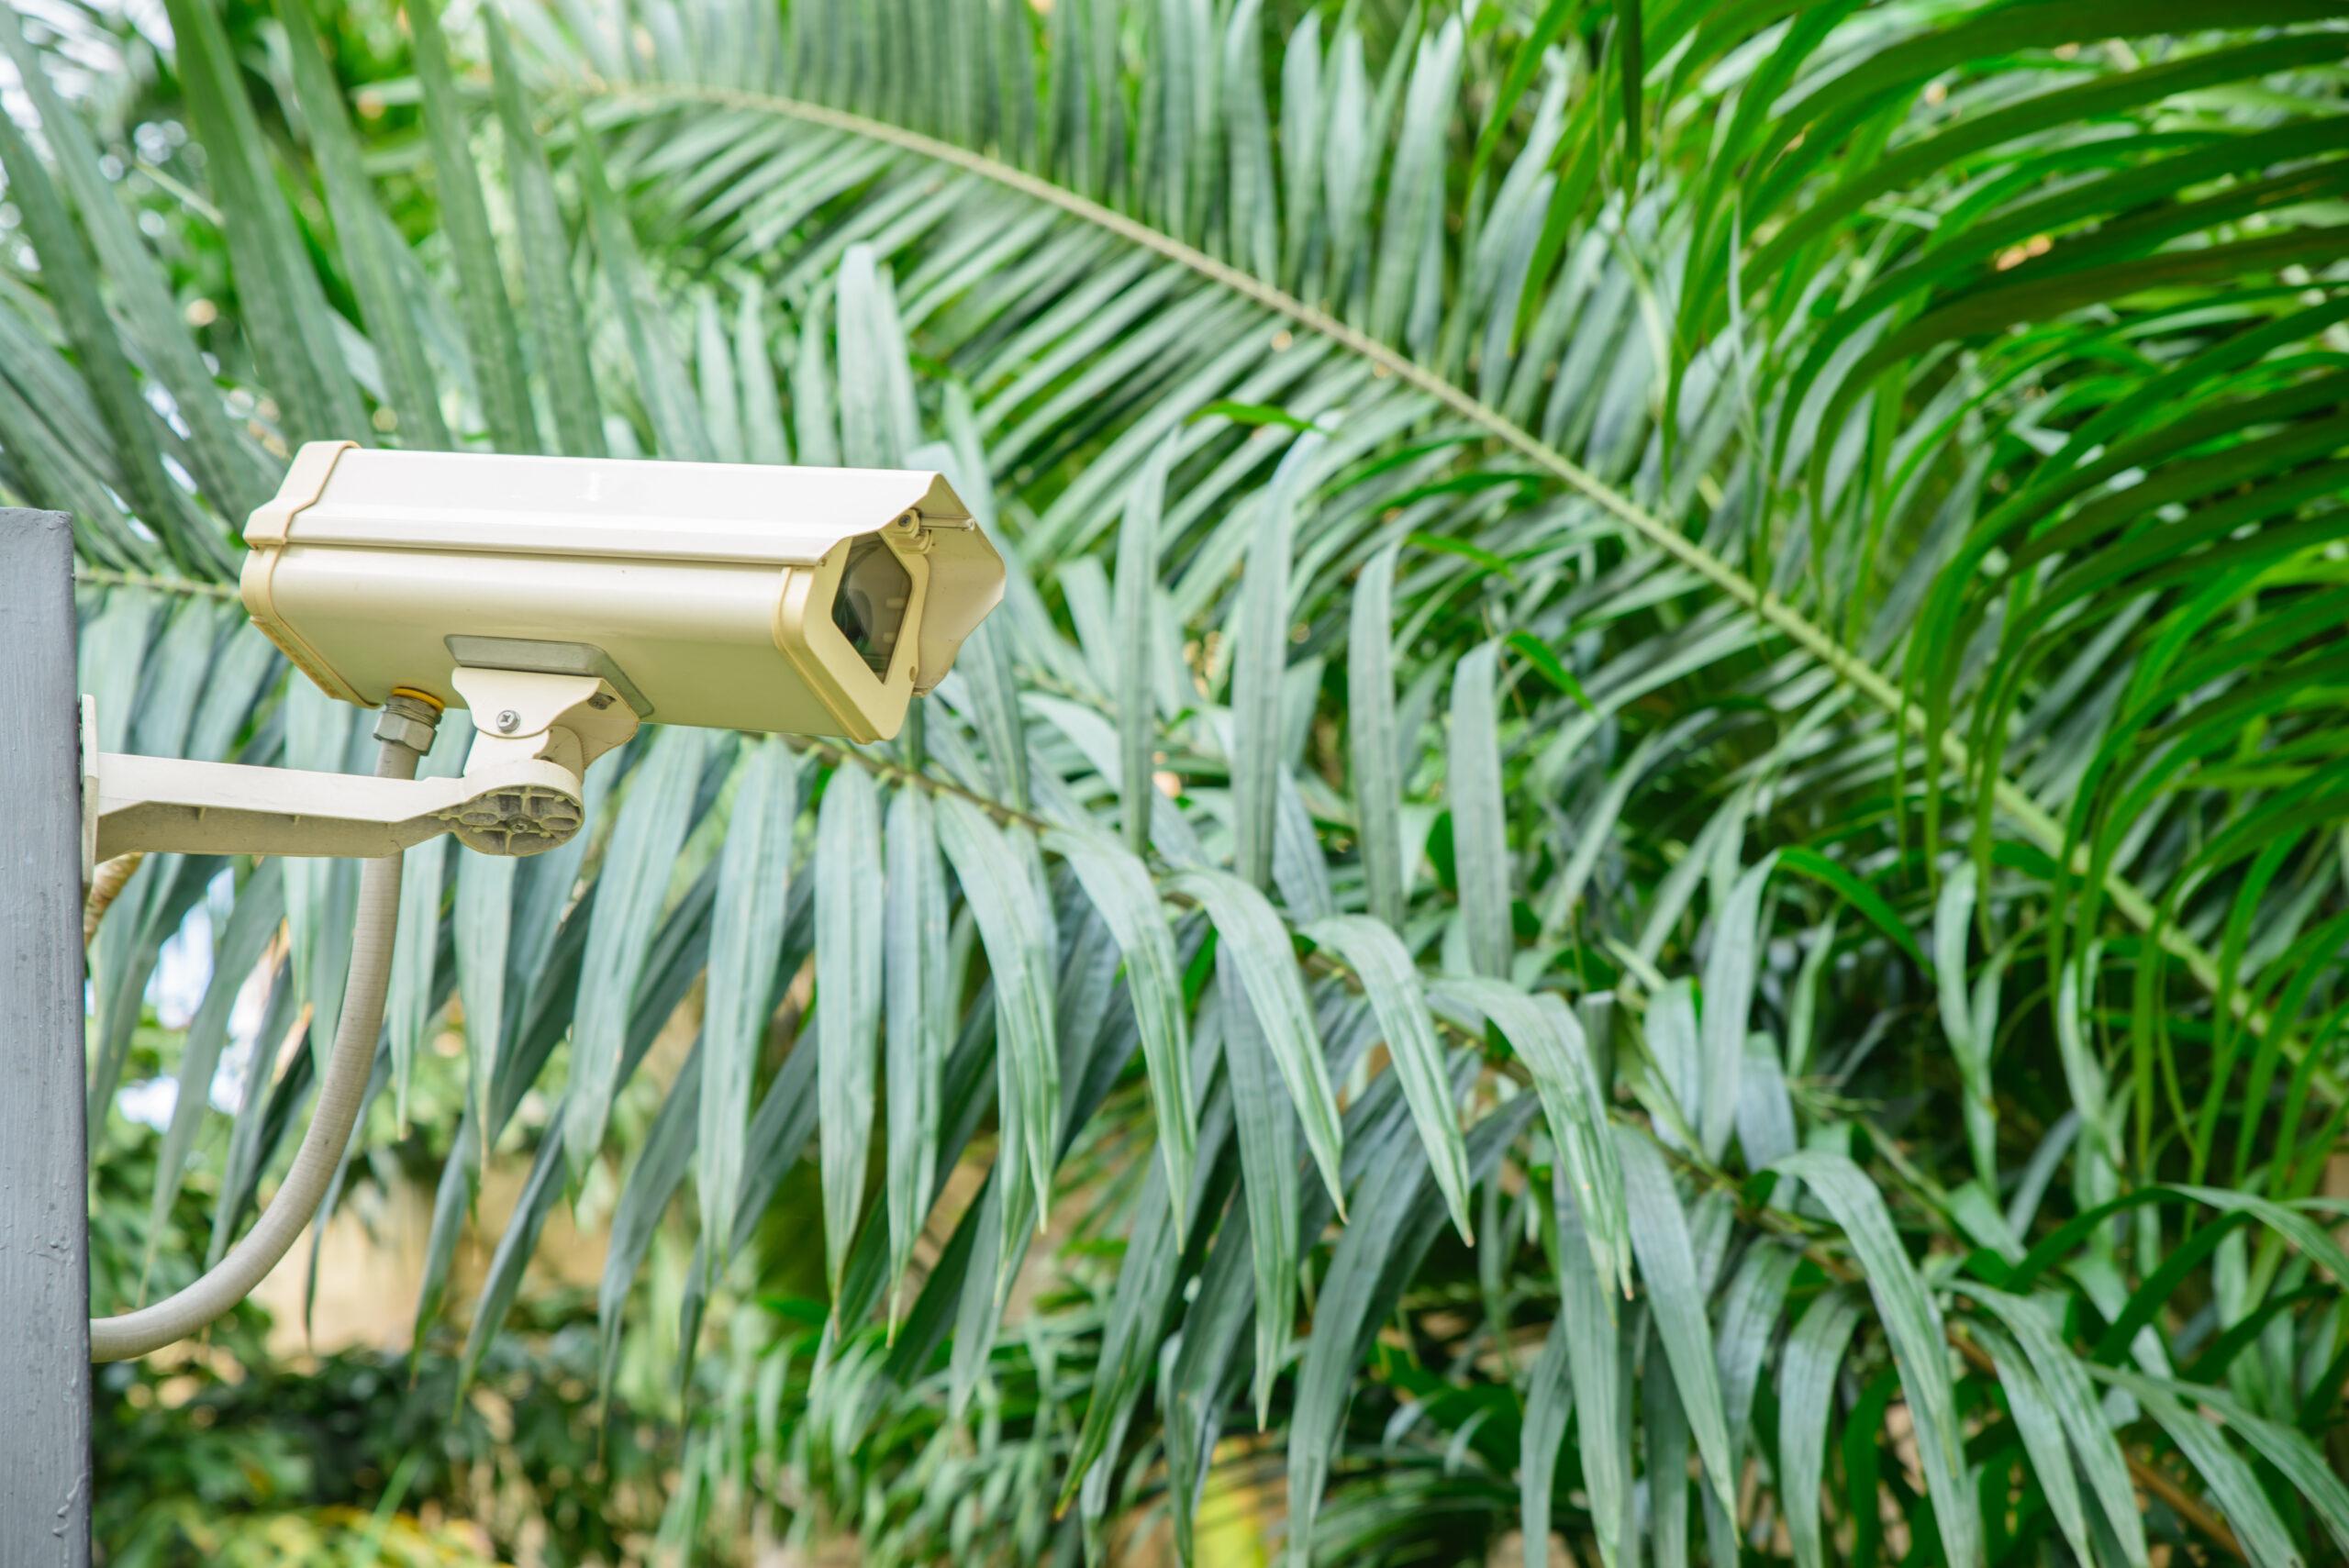 Pentingnya Pemeliharaan CCTV